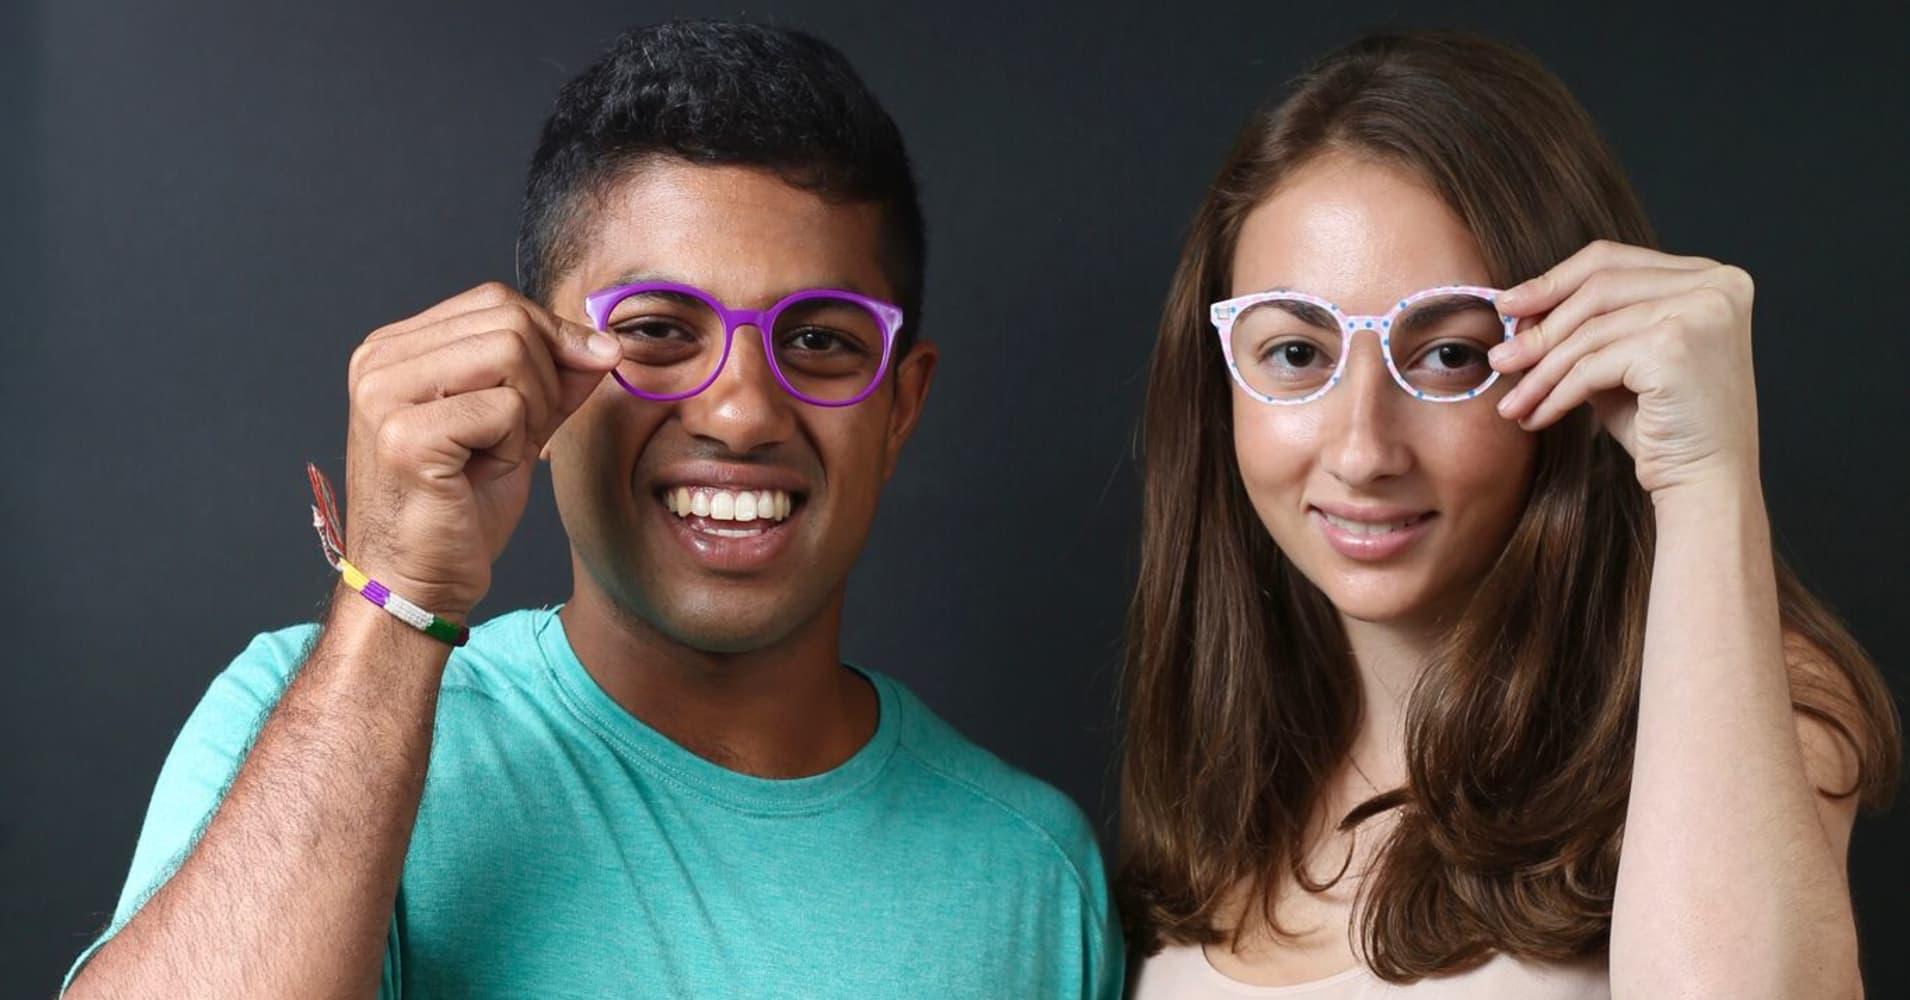 Nathan Kondamuri and Sophia Edelstein, co-founders of Pair Eyewear